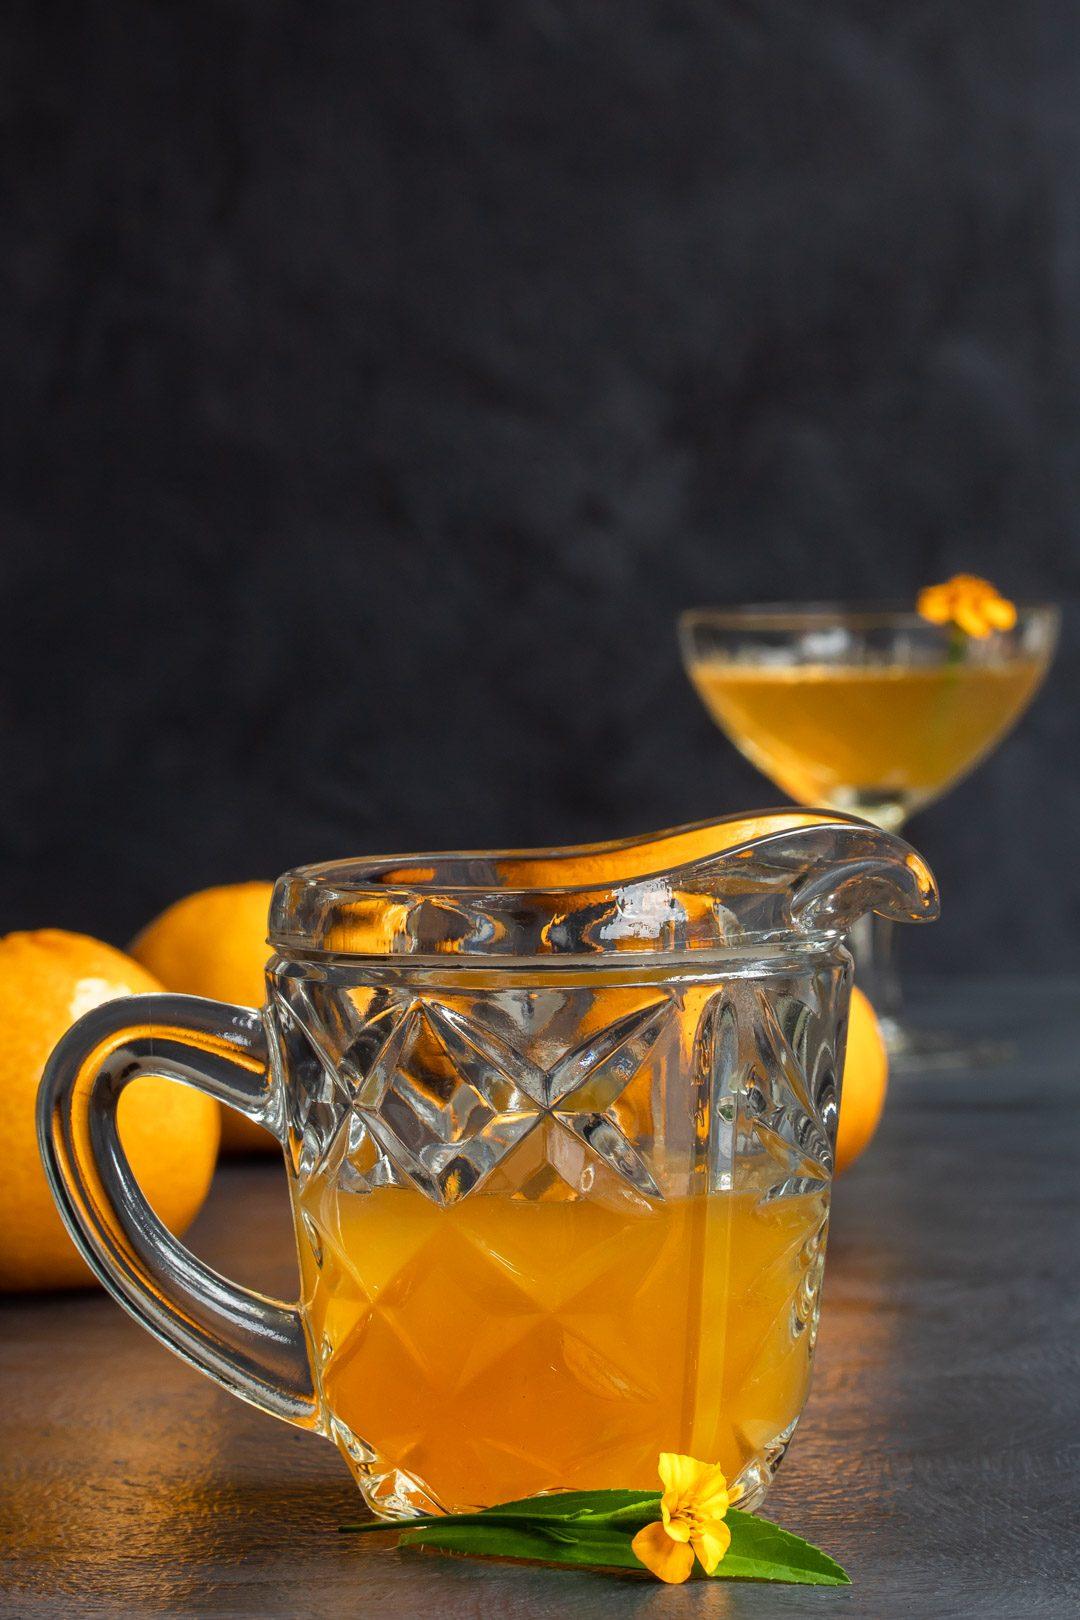 Mandarin tarragon shrub syrup drinking vinegar in vintage glass jug with cocktail in background